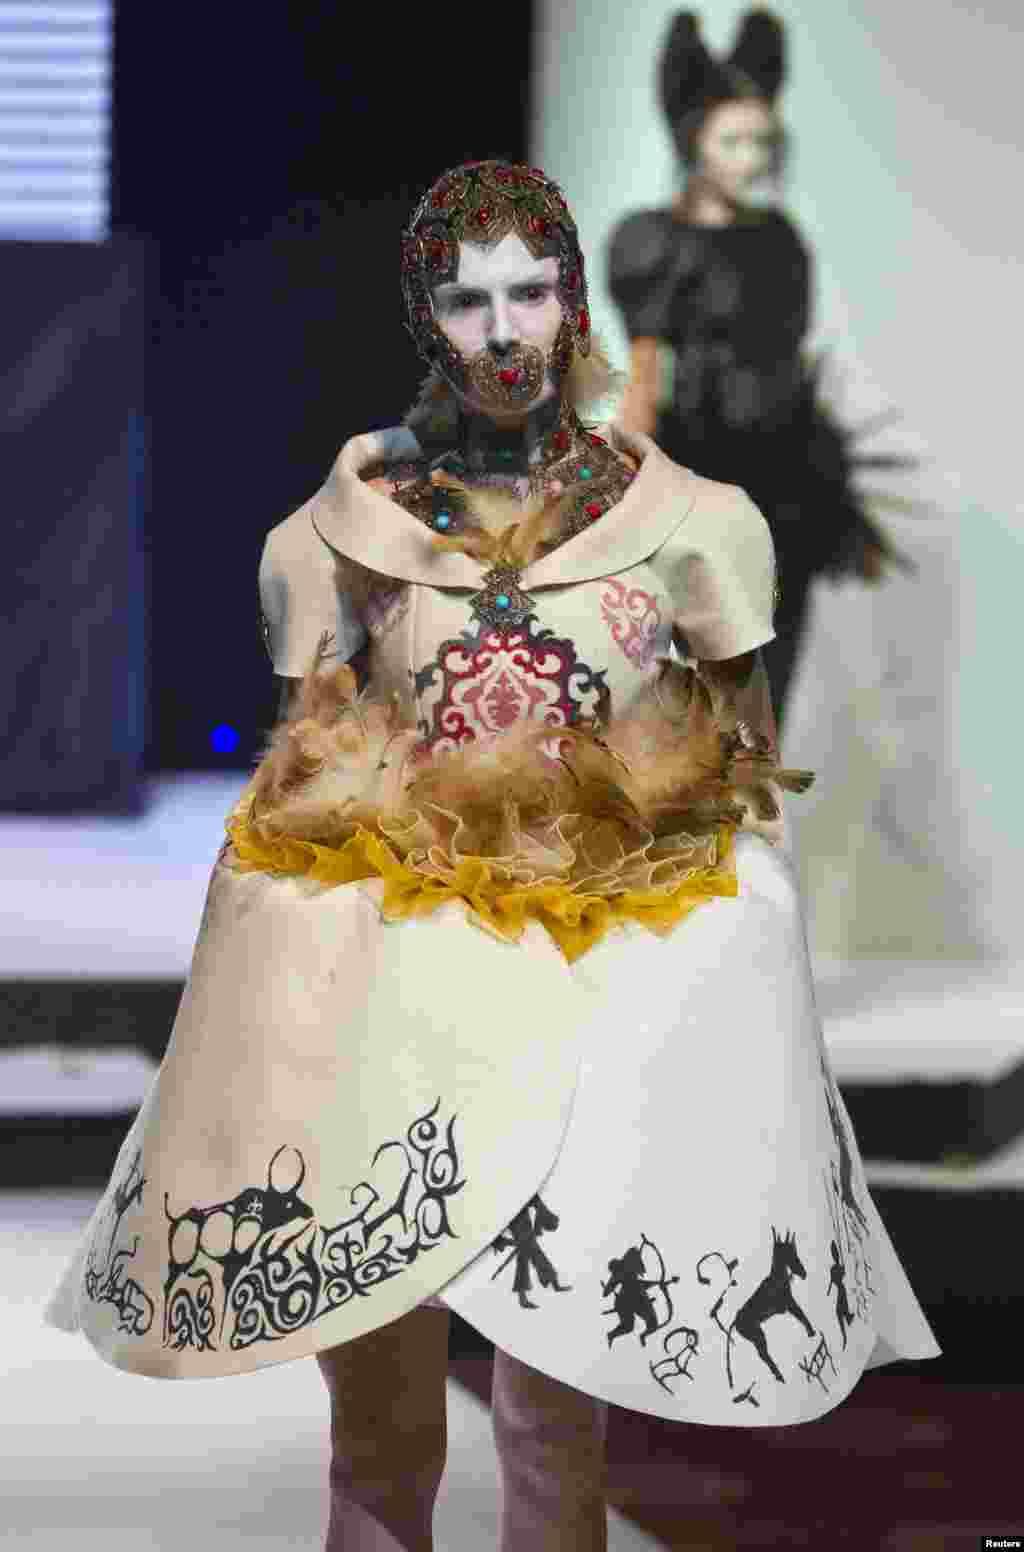 Aidar Akhmetov raised eyebrows with this unusual dress.